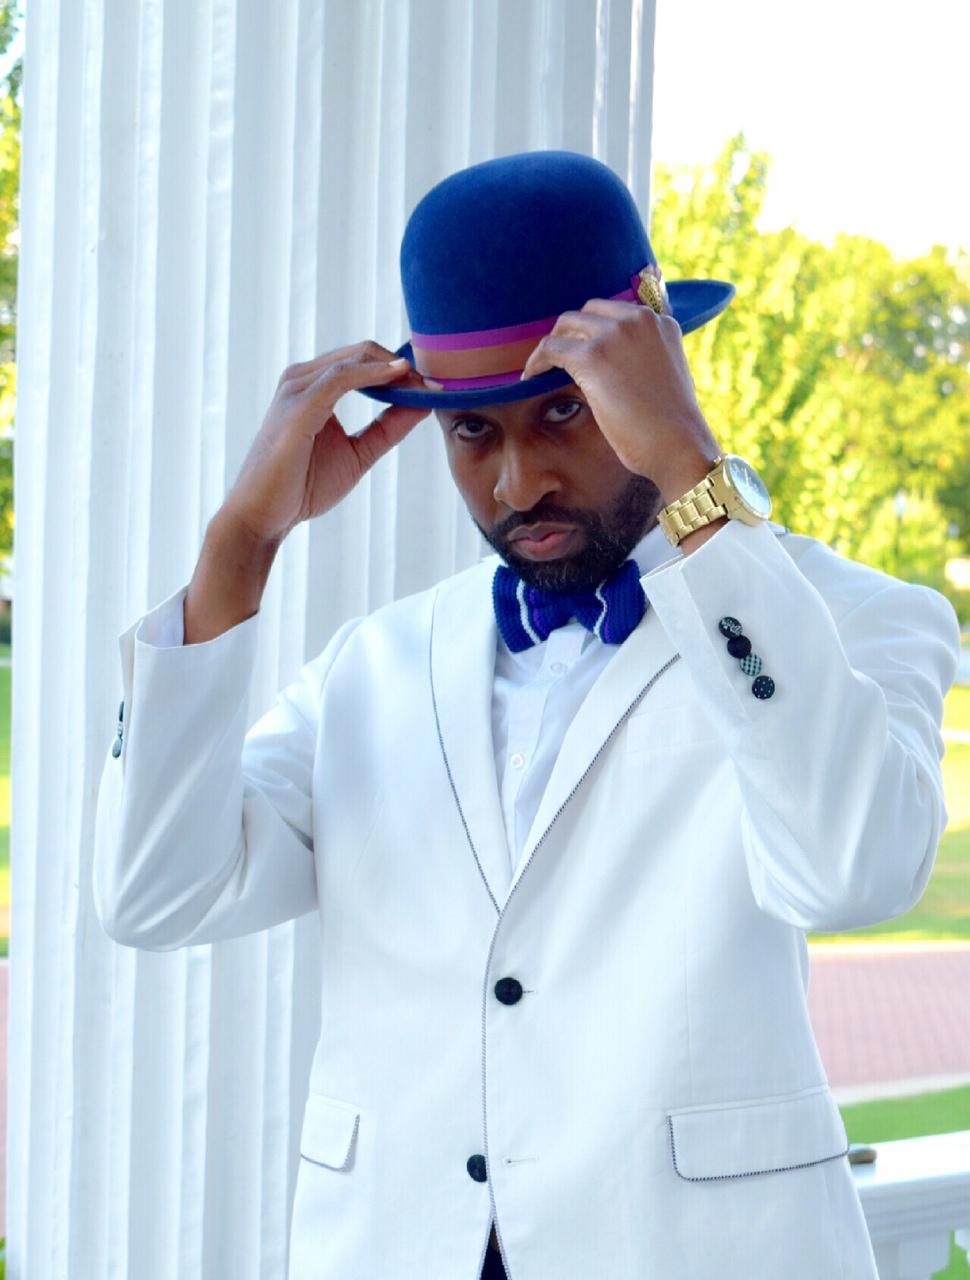 Dress Like AGent's Brian Hampton